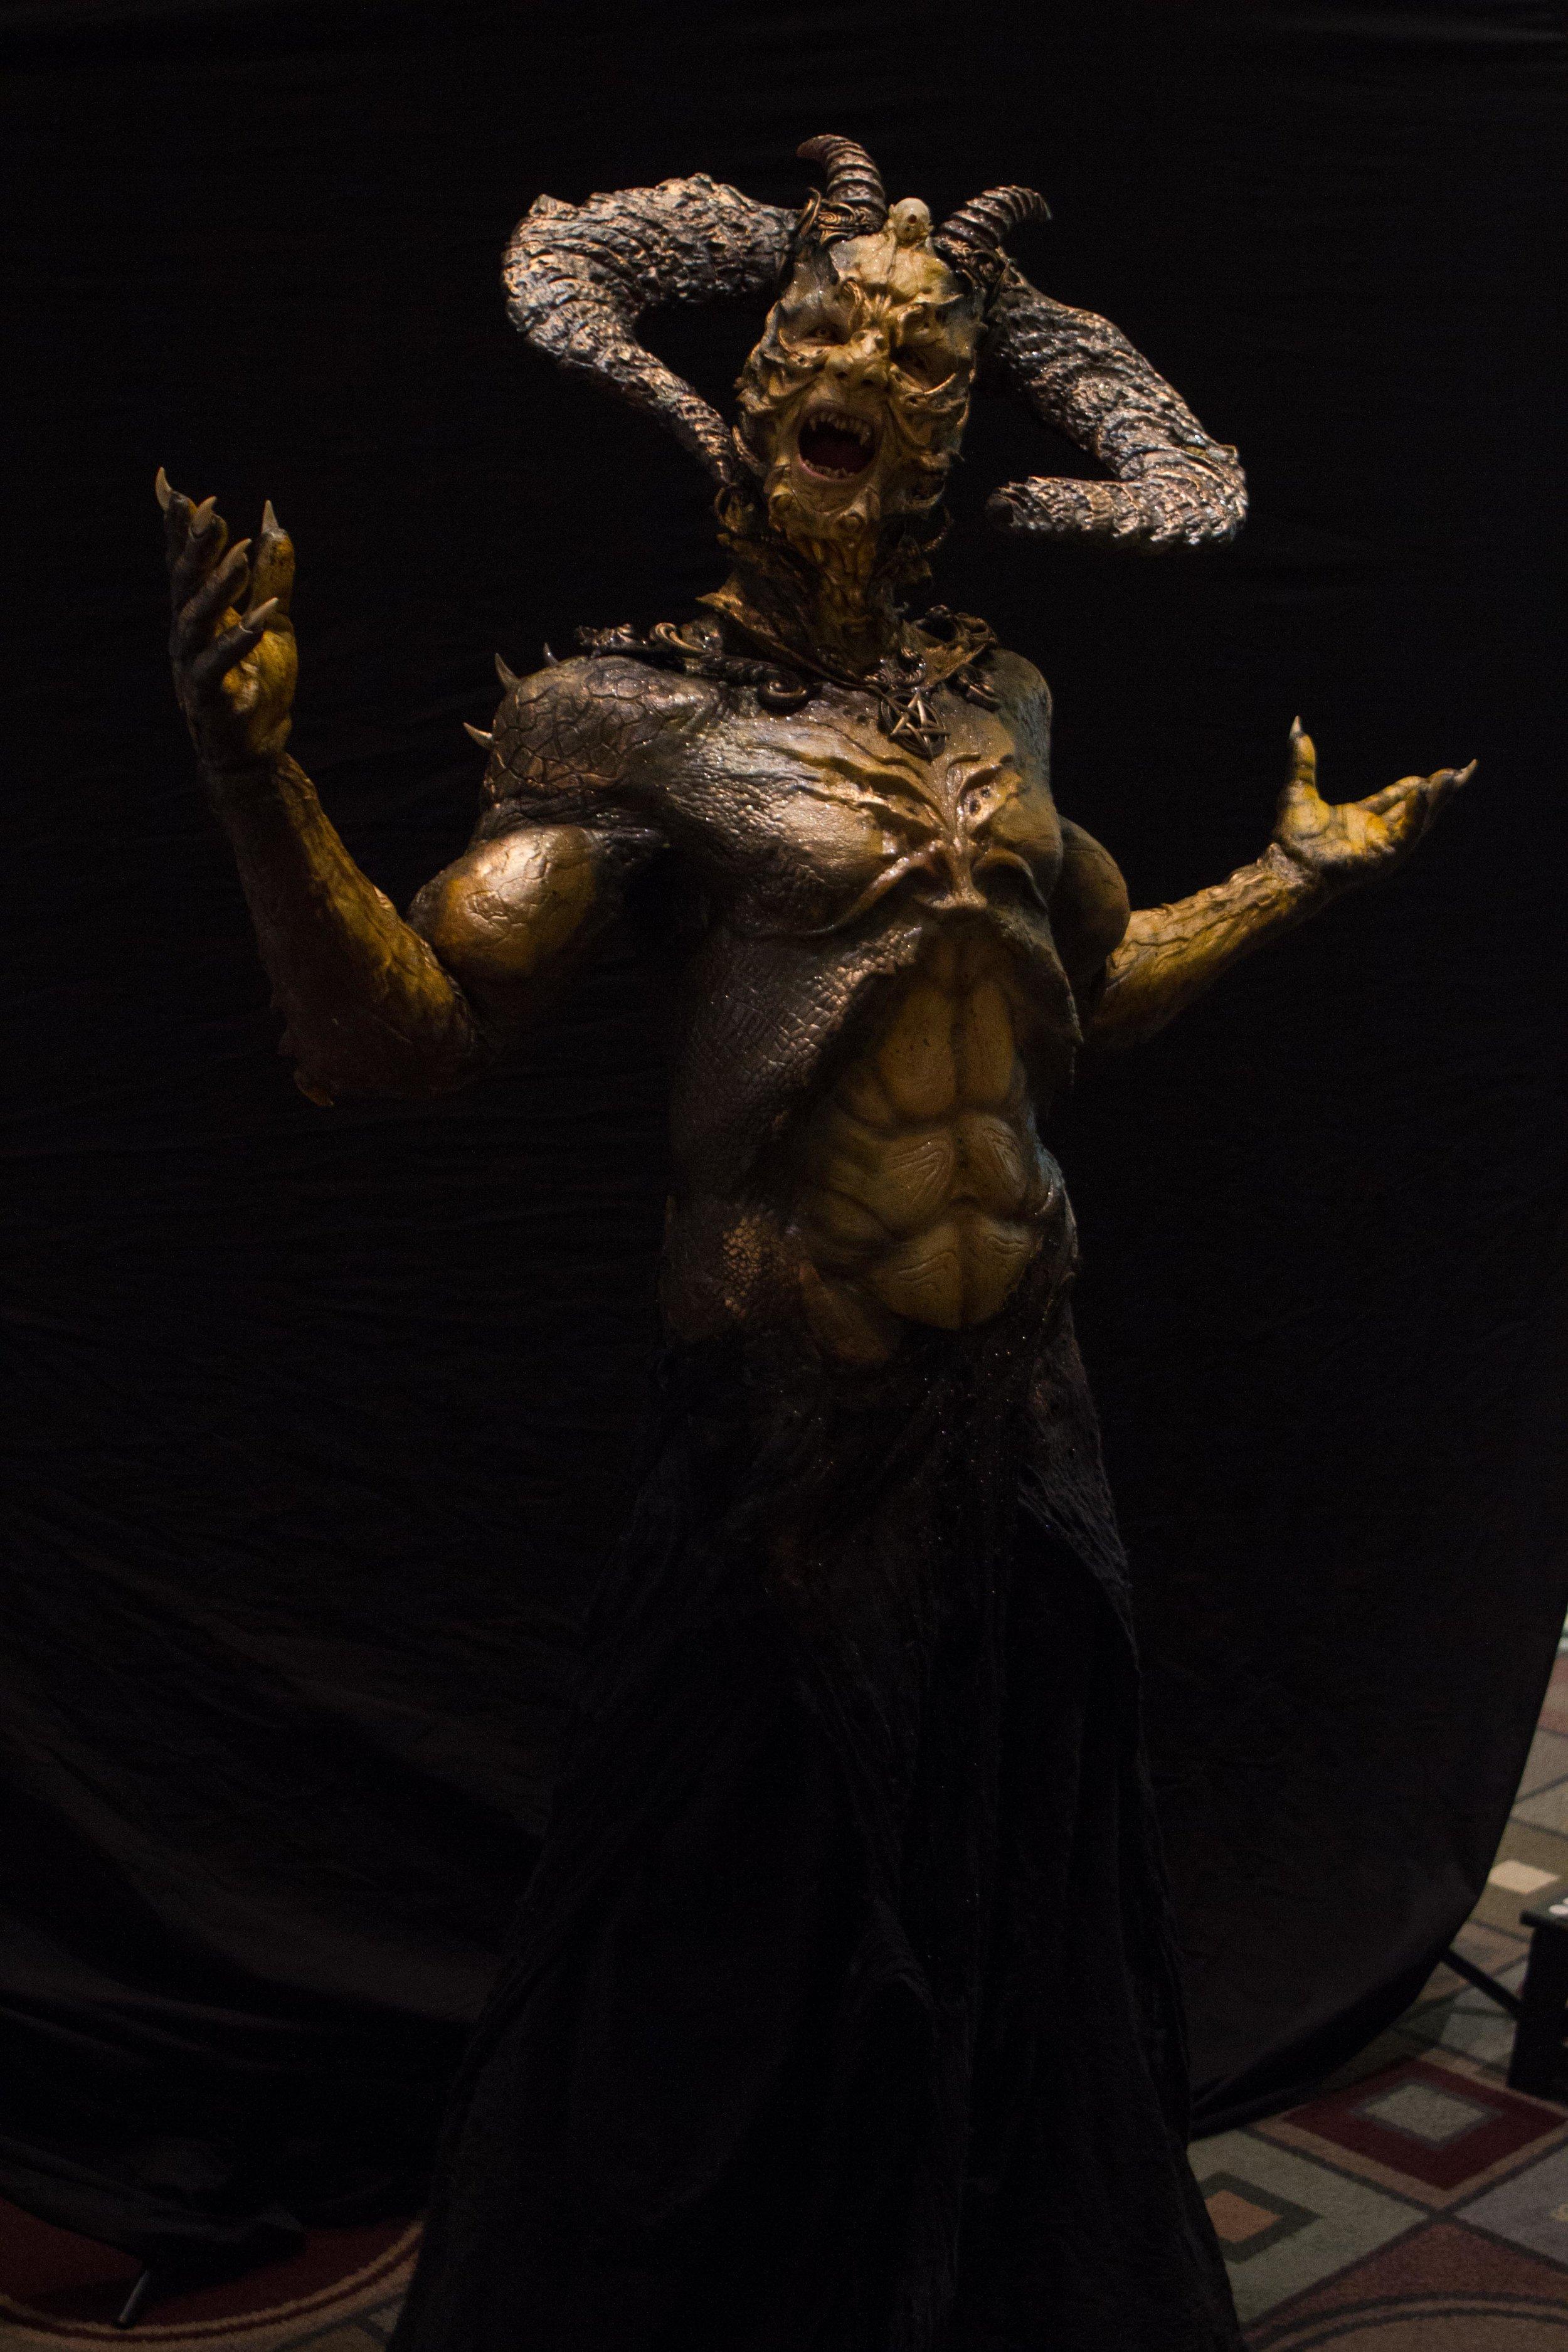 IMATS 2017 - FX Creator Josef Rarach & Vlad Taupesh Fantasy Special Effects Makeup (www.creativecastlestudios.com:fx-creator - www.KyleReaArt.com - www.KyleReaPhotography.com) 38.jpg